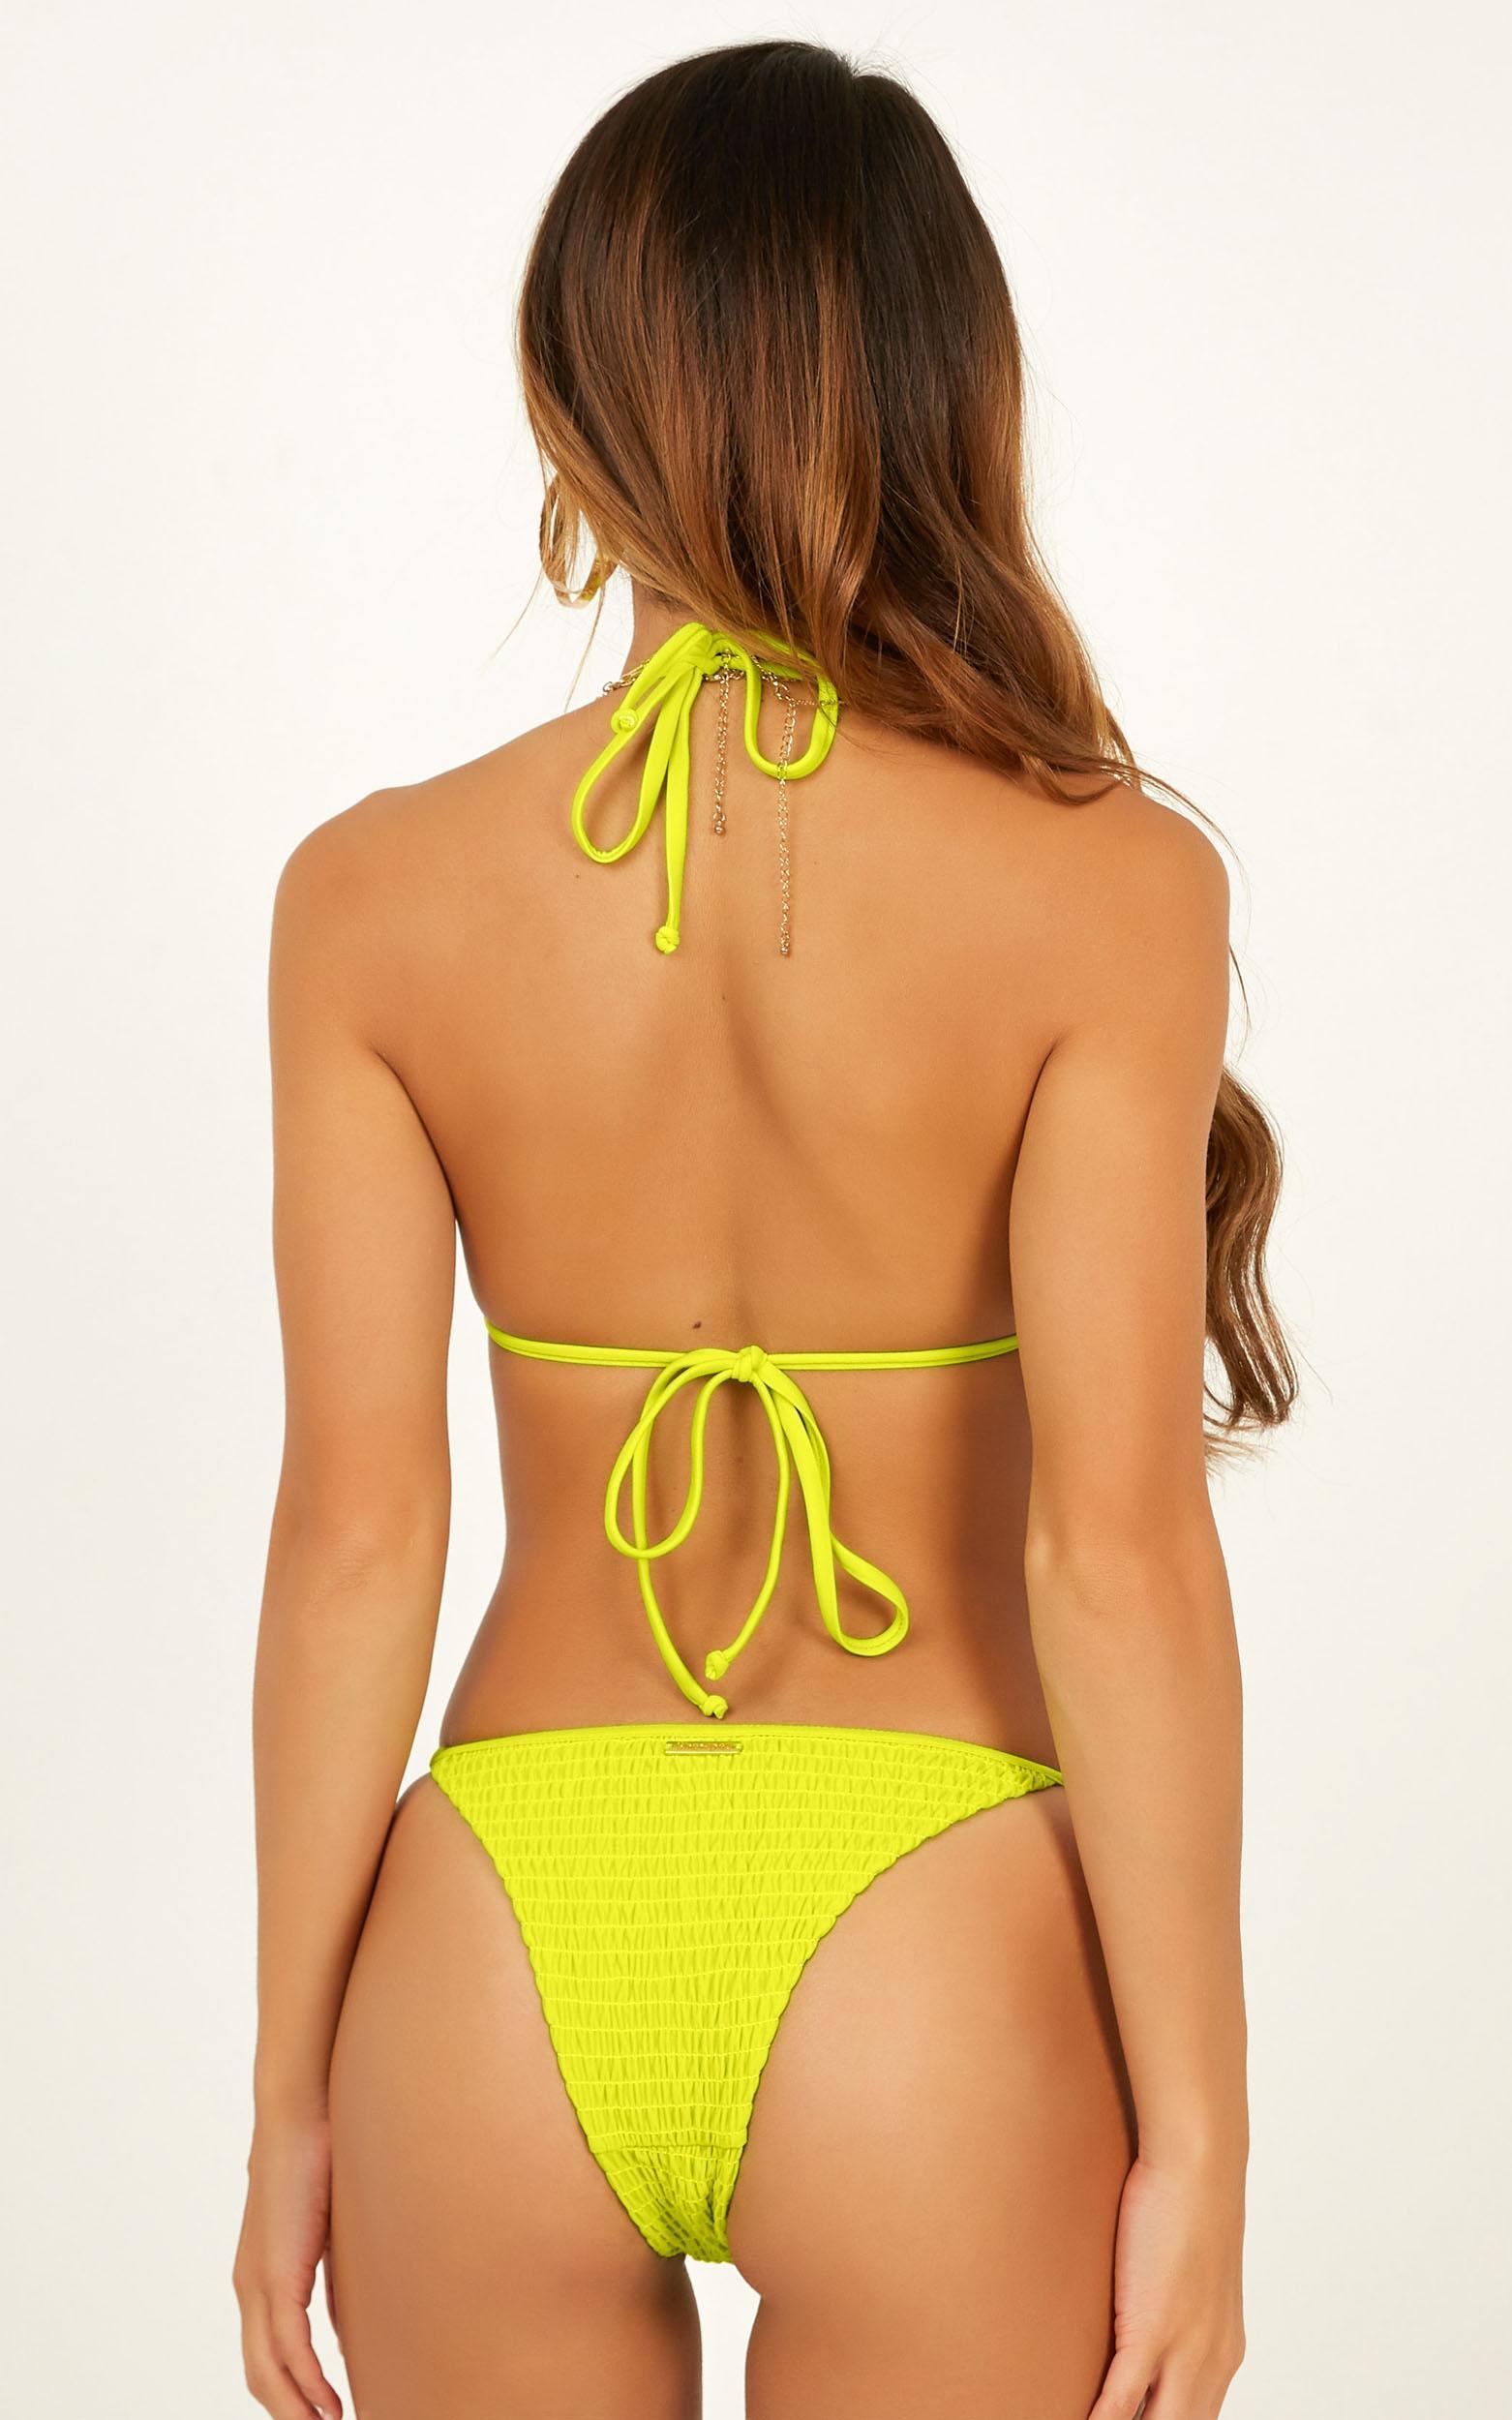 Chloe Bikini Top in lime - 16 (XXL), Green, hi-res image number null